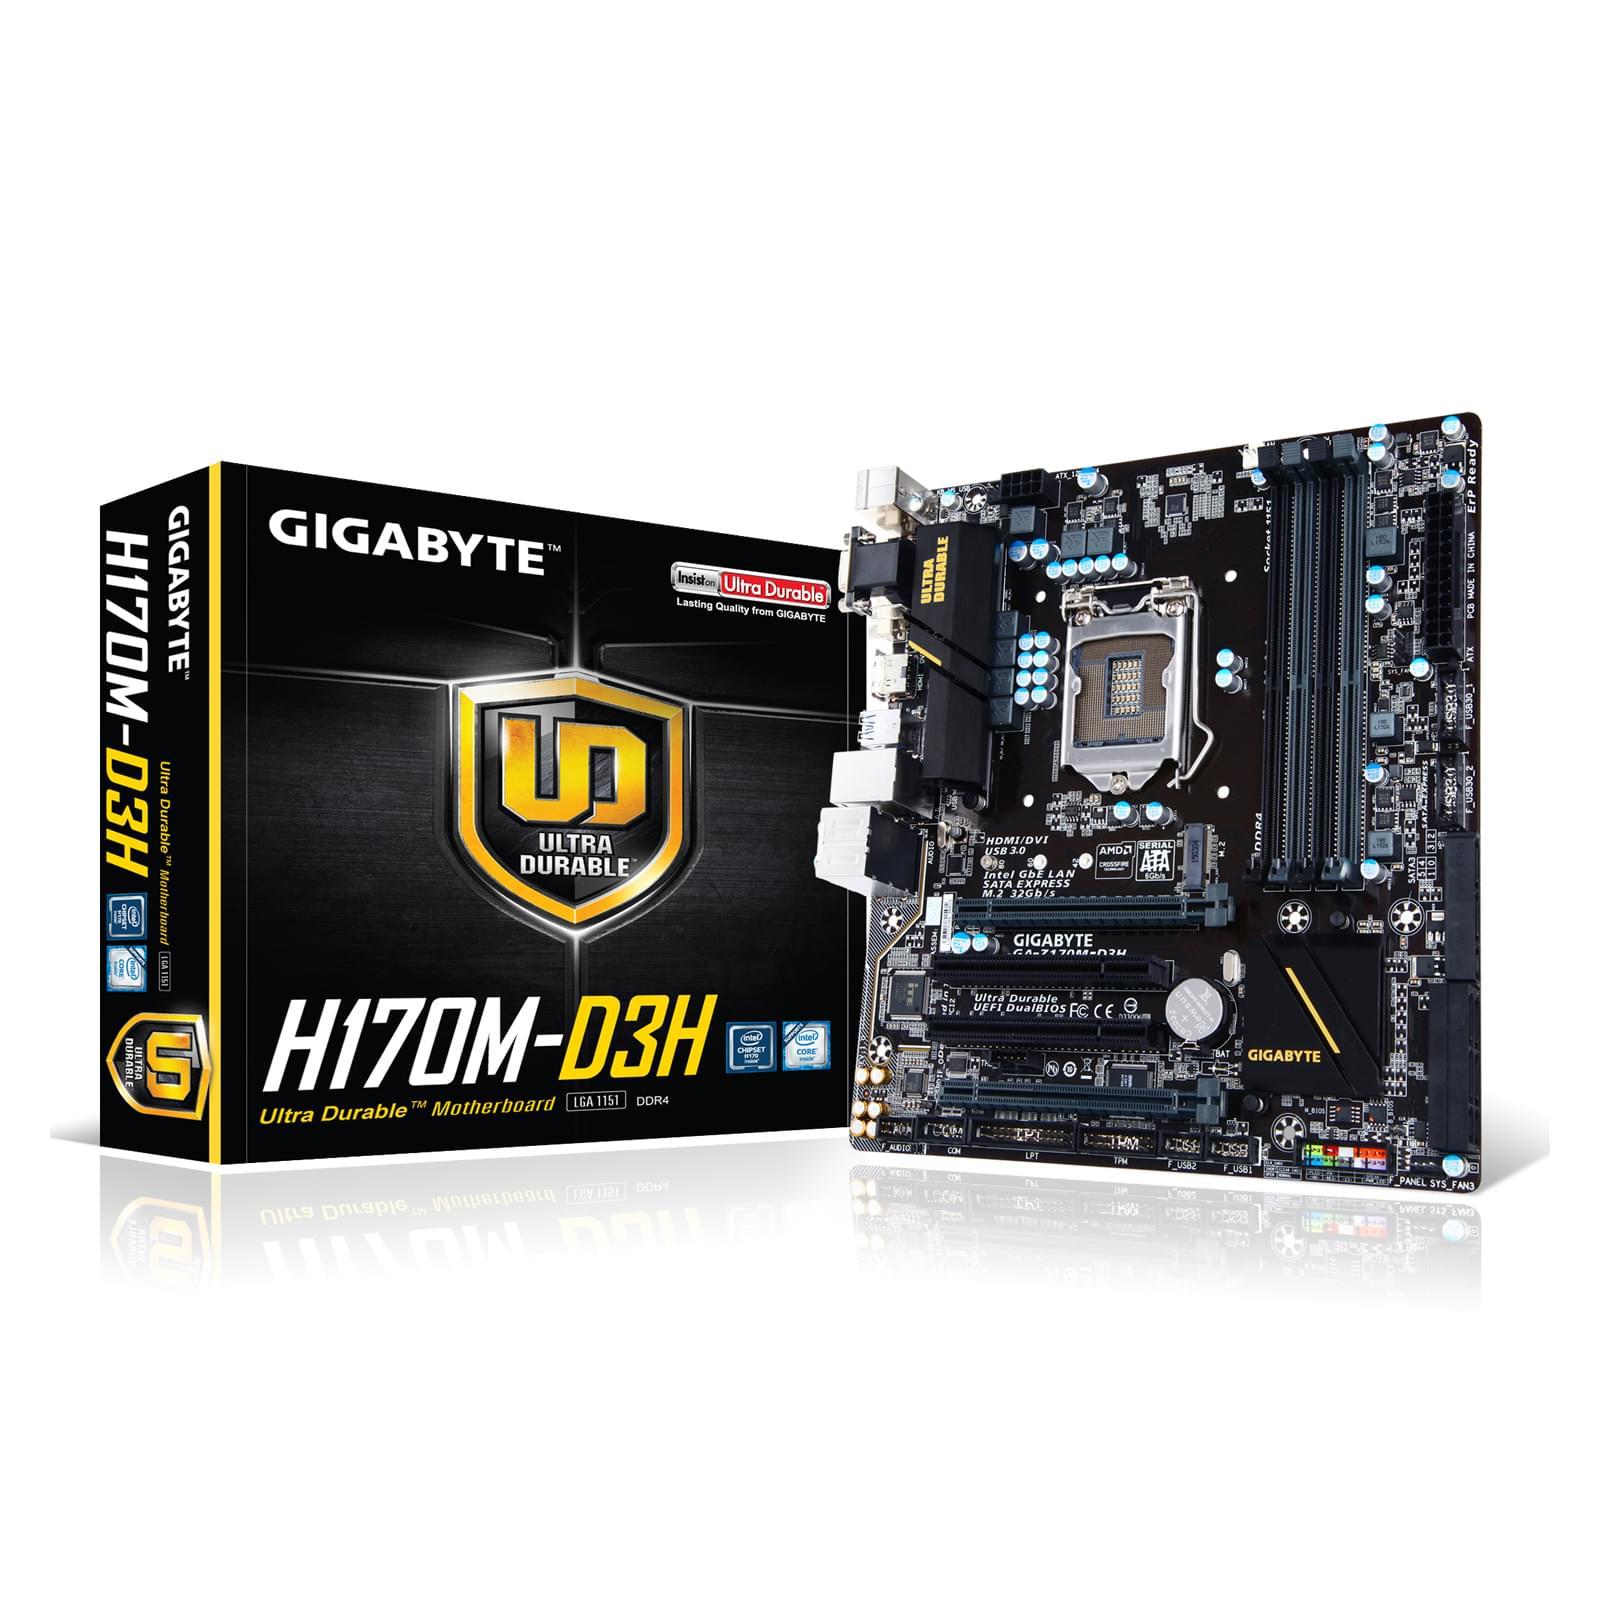 Gigabyte GA-H170M-D3H Micro-ATX DDR4 - Carte mère Gigabyte - 0